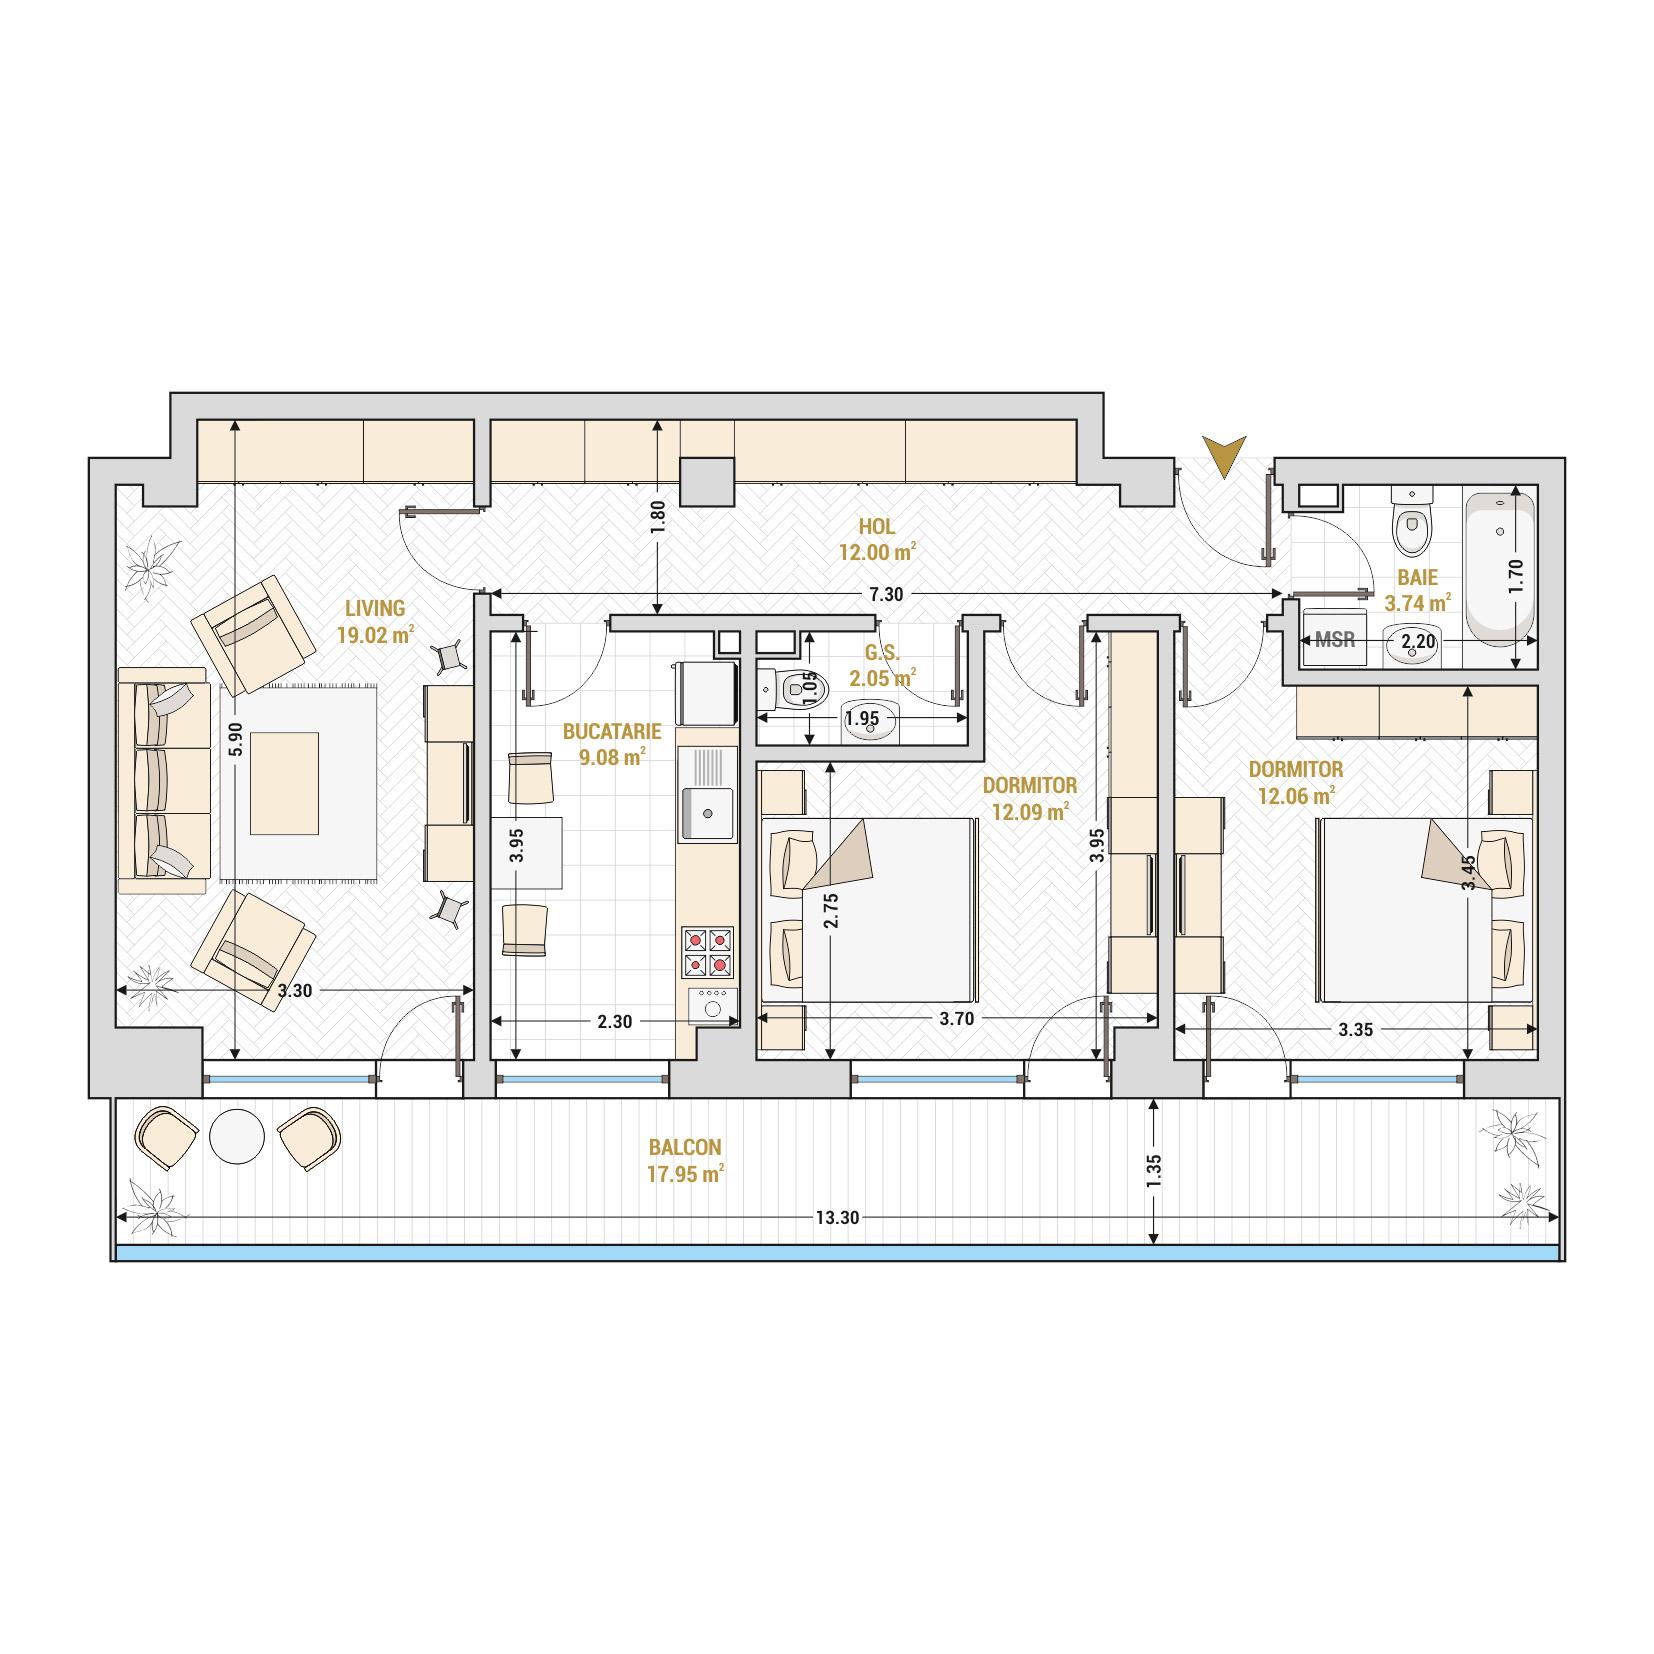 Apartament 3 camere de vanzare Bucuresti - Catedral Residence - Marriott, Piata Unirii, 13 Septembrie, Izvor - Tip 5 - T2